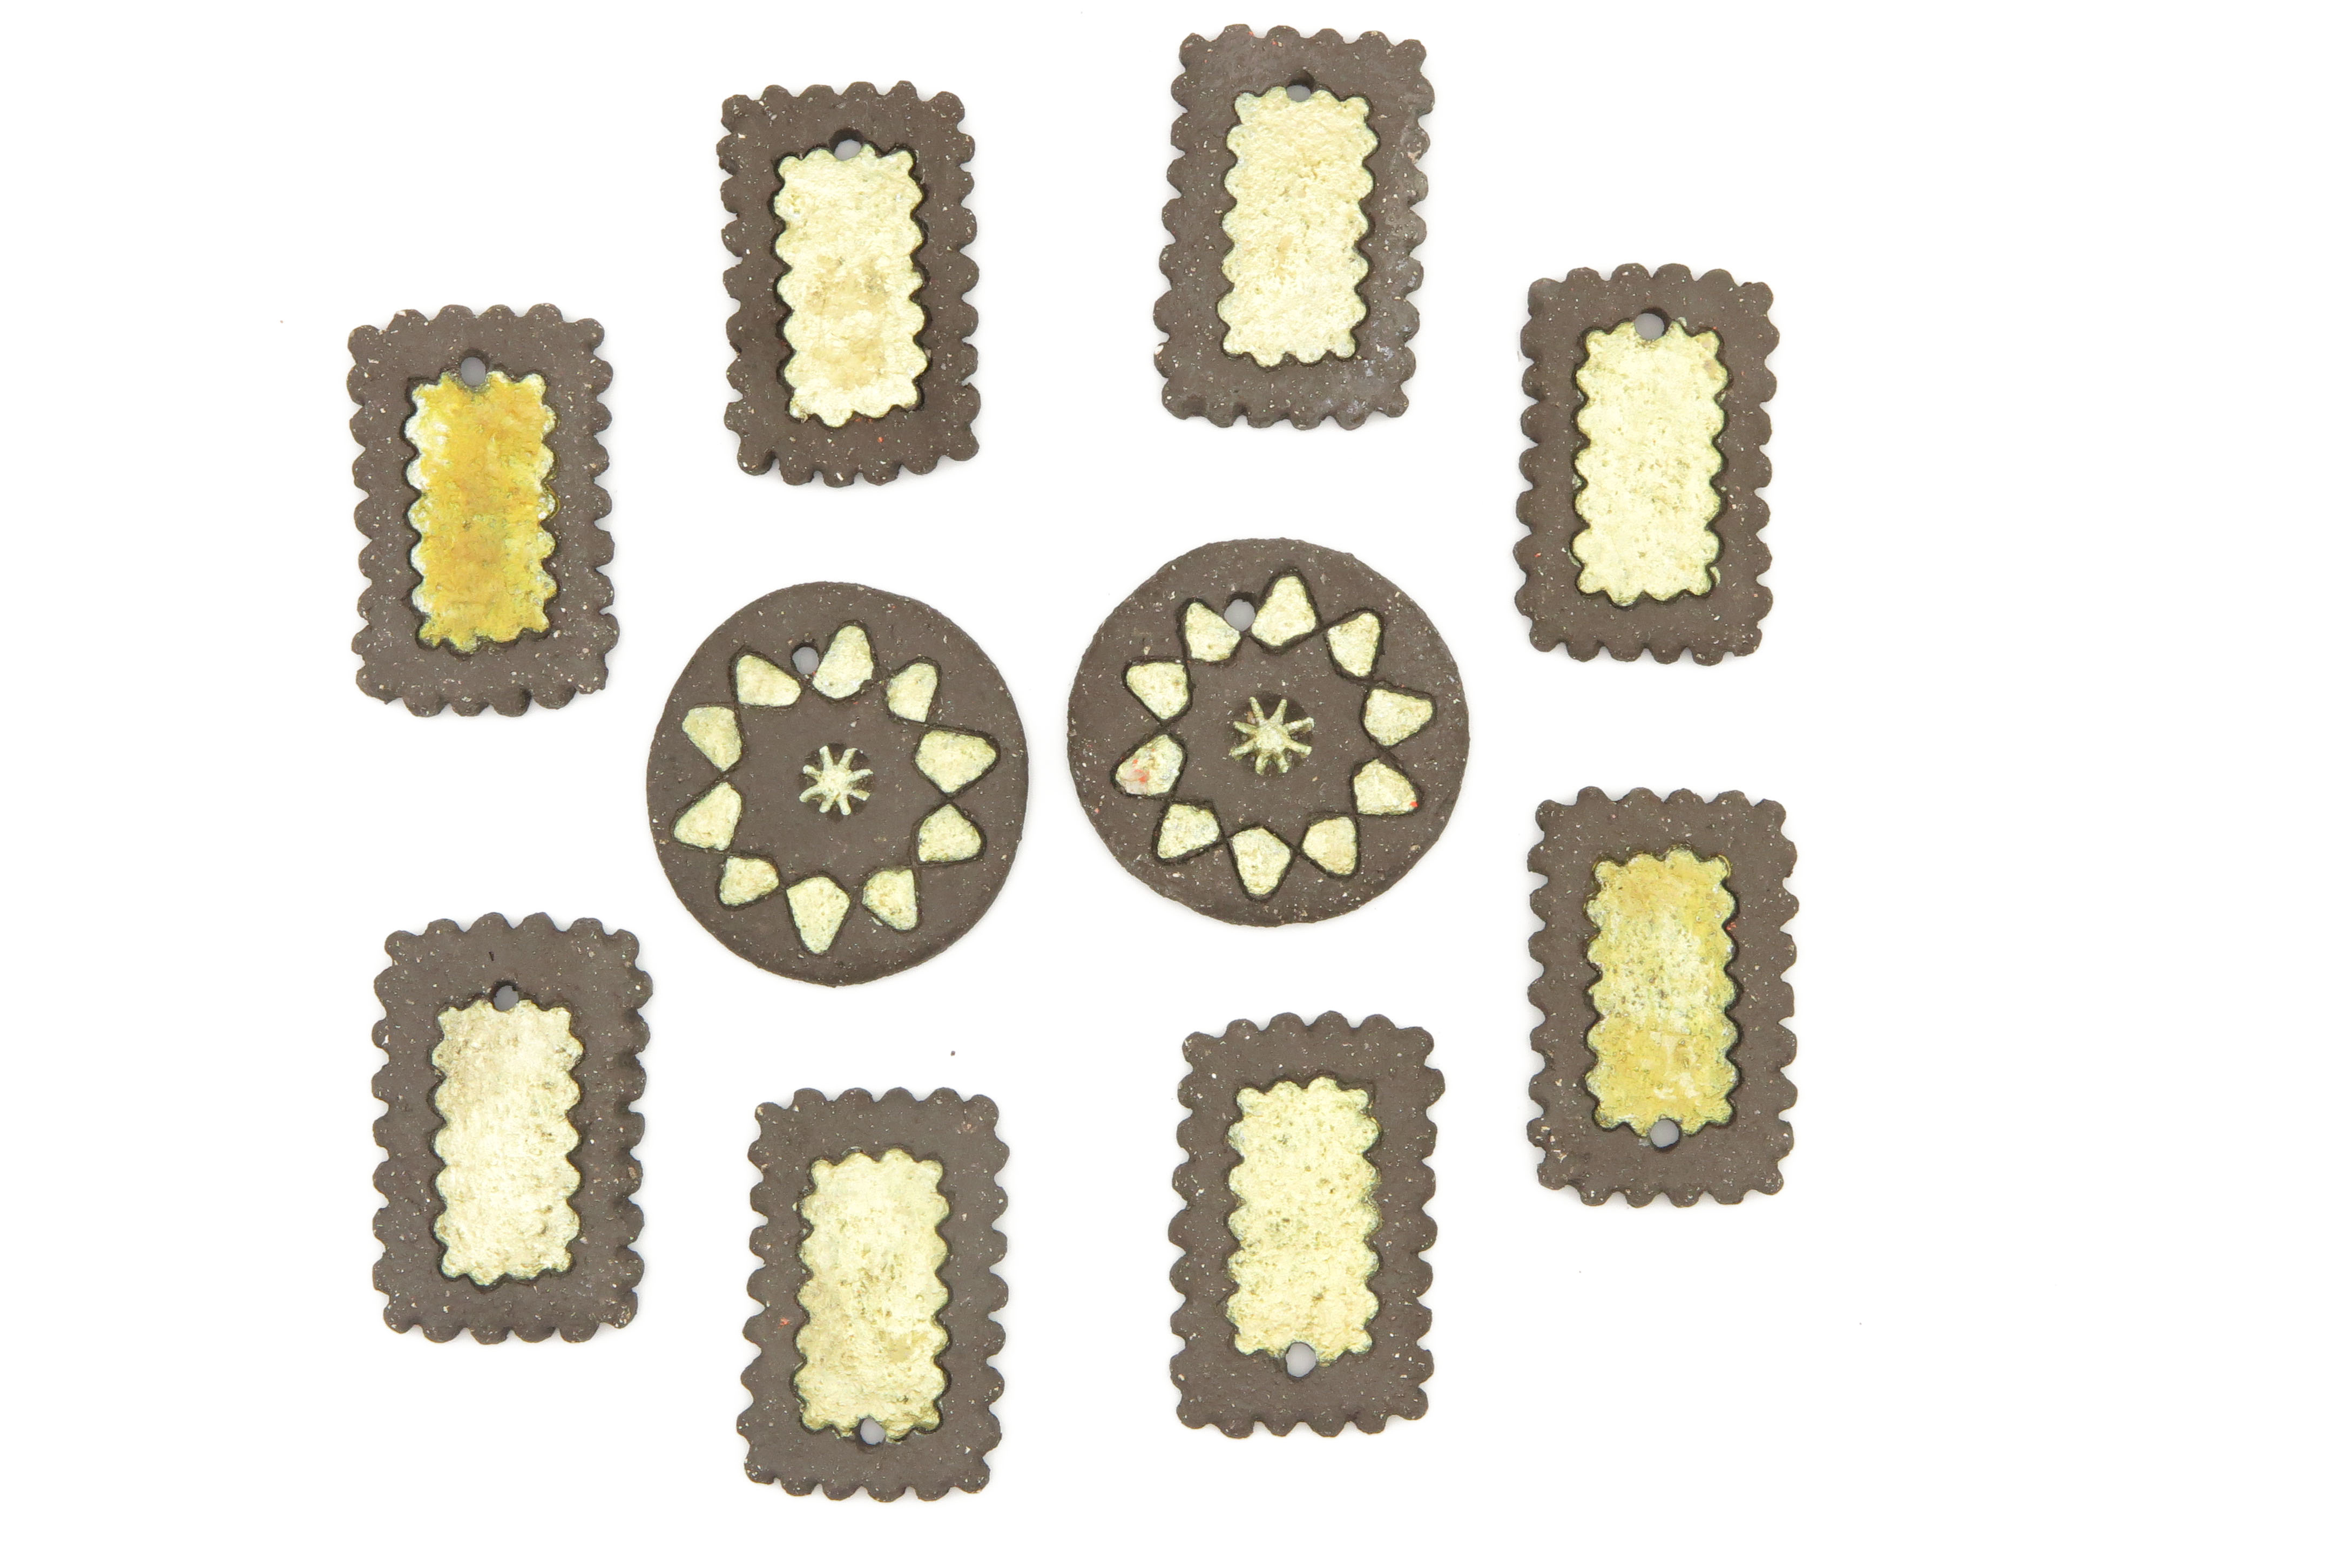 10 Medaillon Lebkuchen Anhänger mit Golddekor 5cm